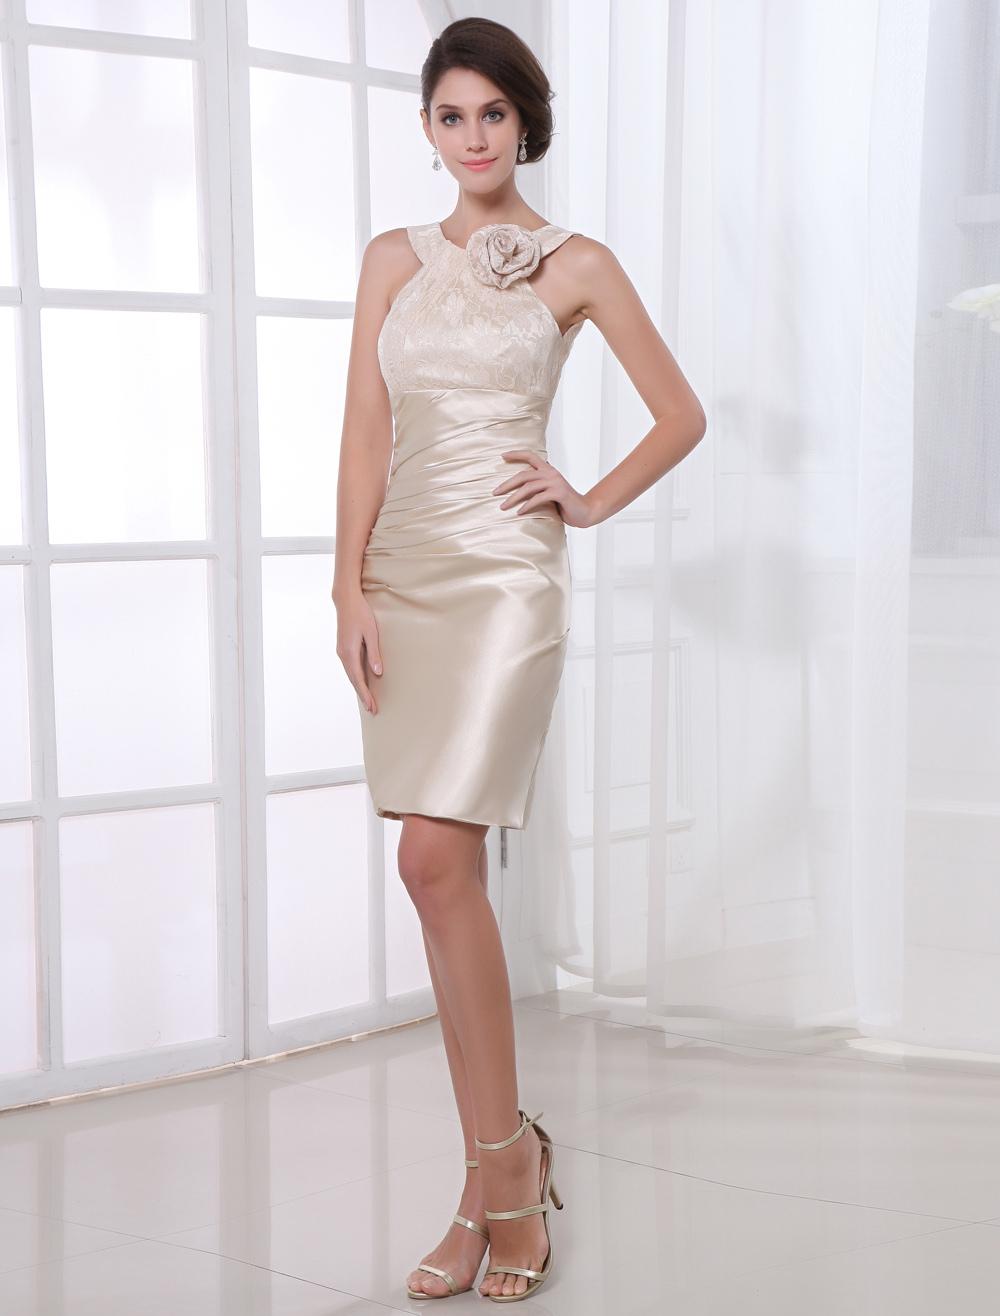 Knee-Length Lace Paneled Cocktail Dress Wedding Guest Dress (Cheap Party Dress) photo